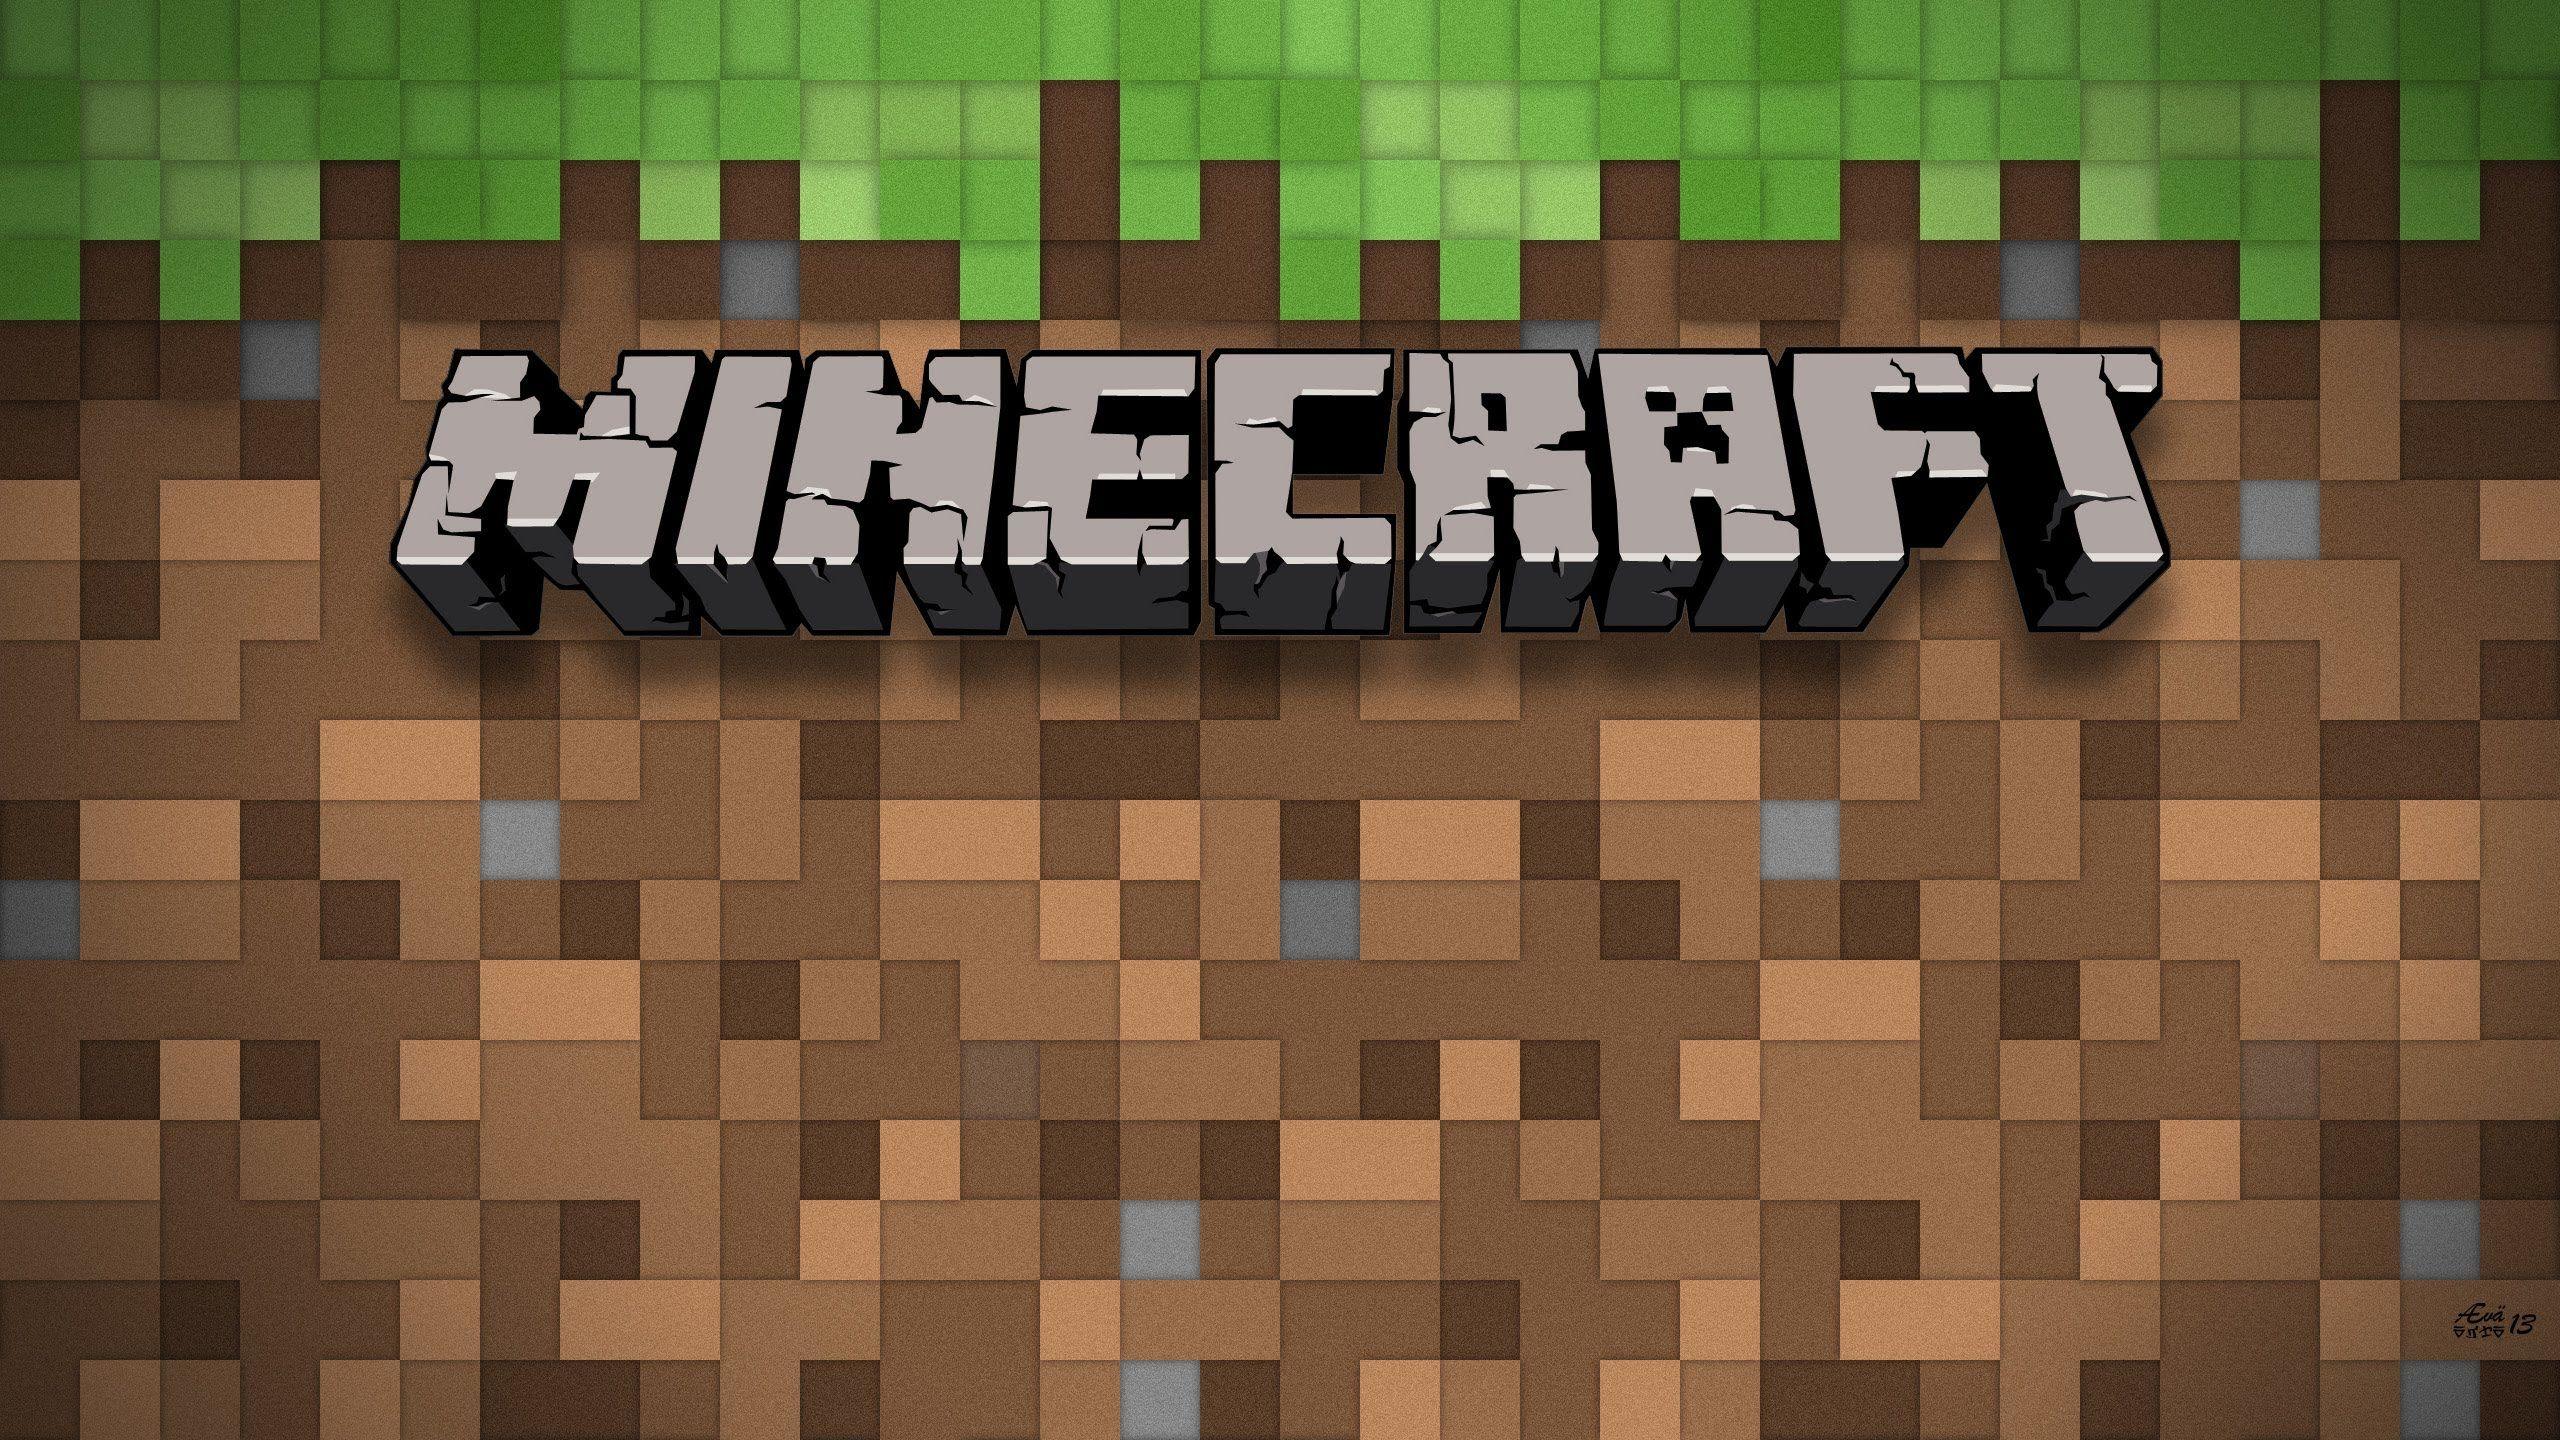 Minecraft Logo Wallpaper Posted By Ryan Peltier